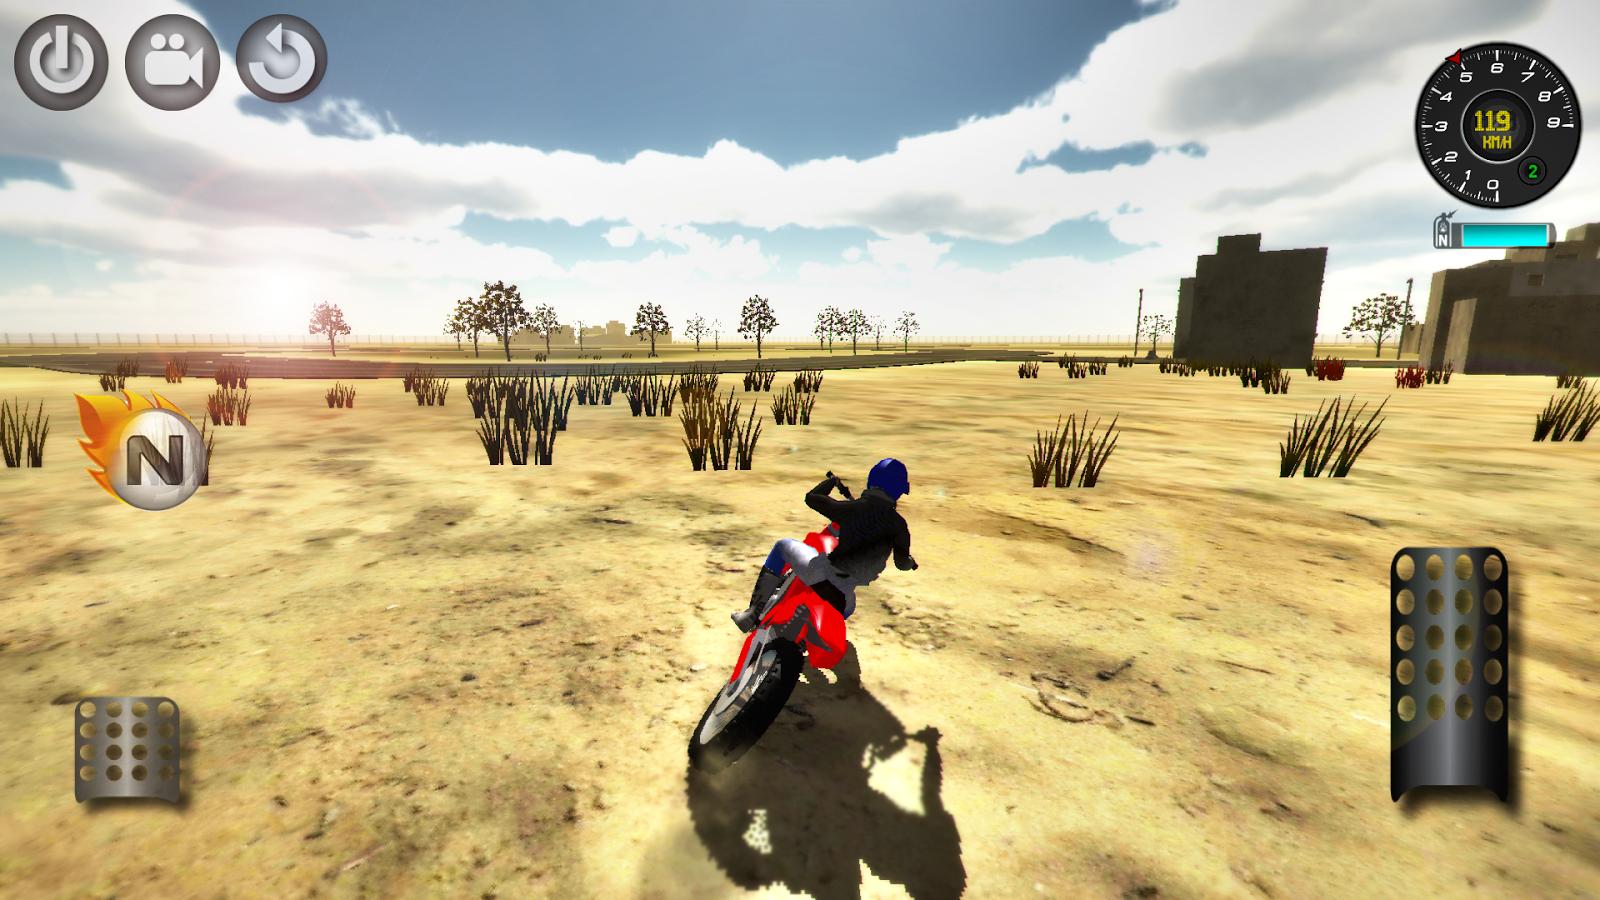 Motorbike 2 Game Motorbike Driving Simulator 2